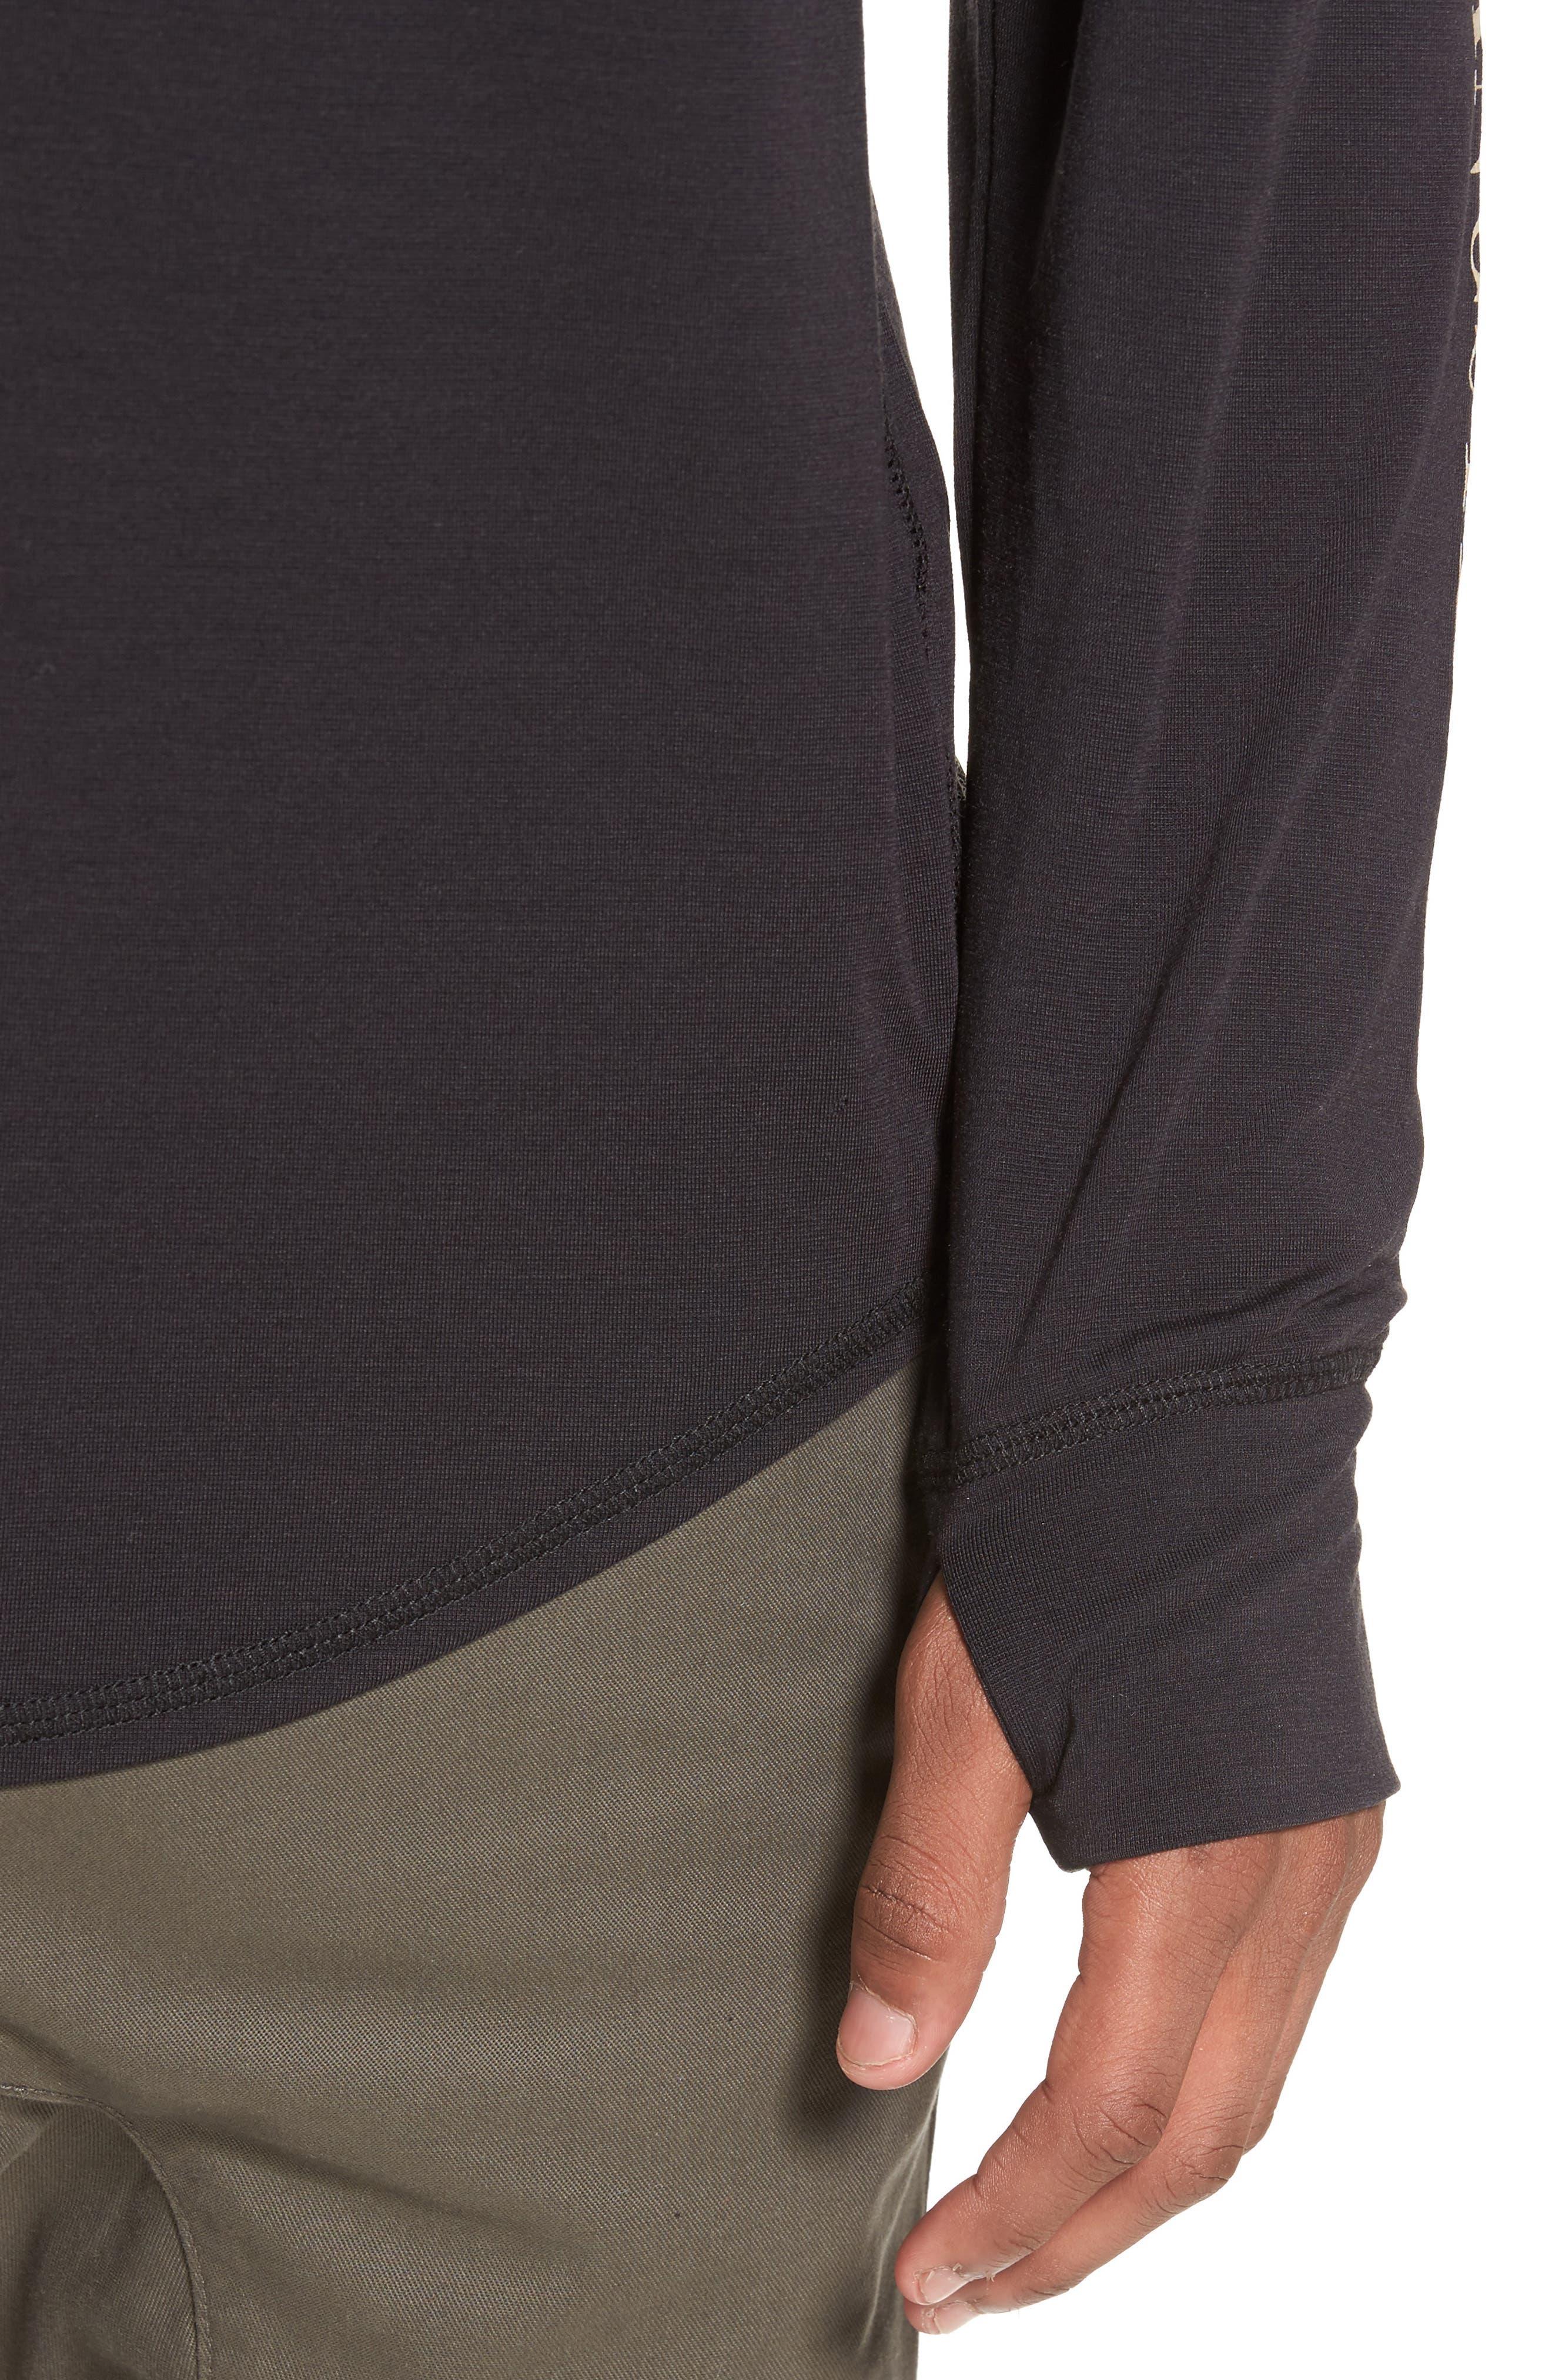 Yantra Wave T-Shirt,                             Alternate thumbnail 4, color,                             Black/ Black